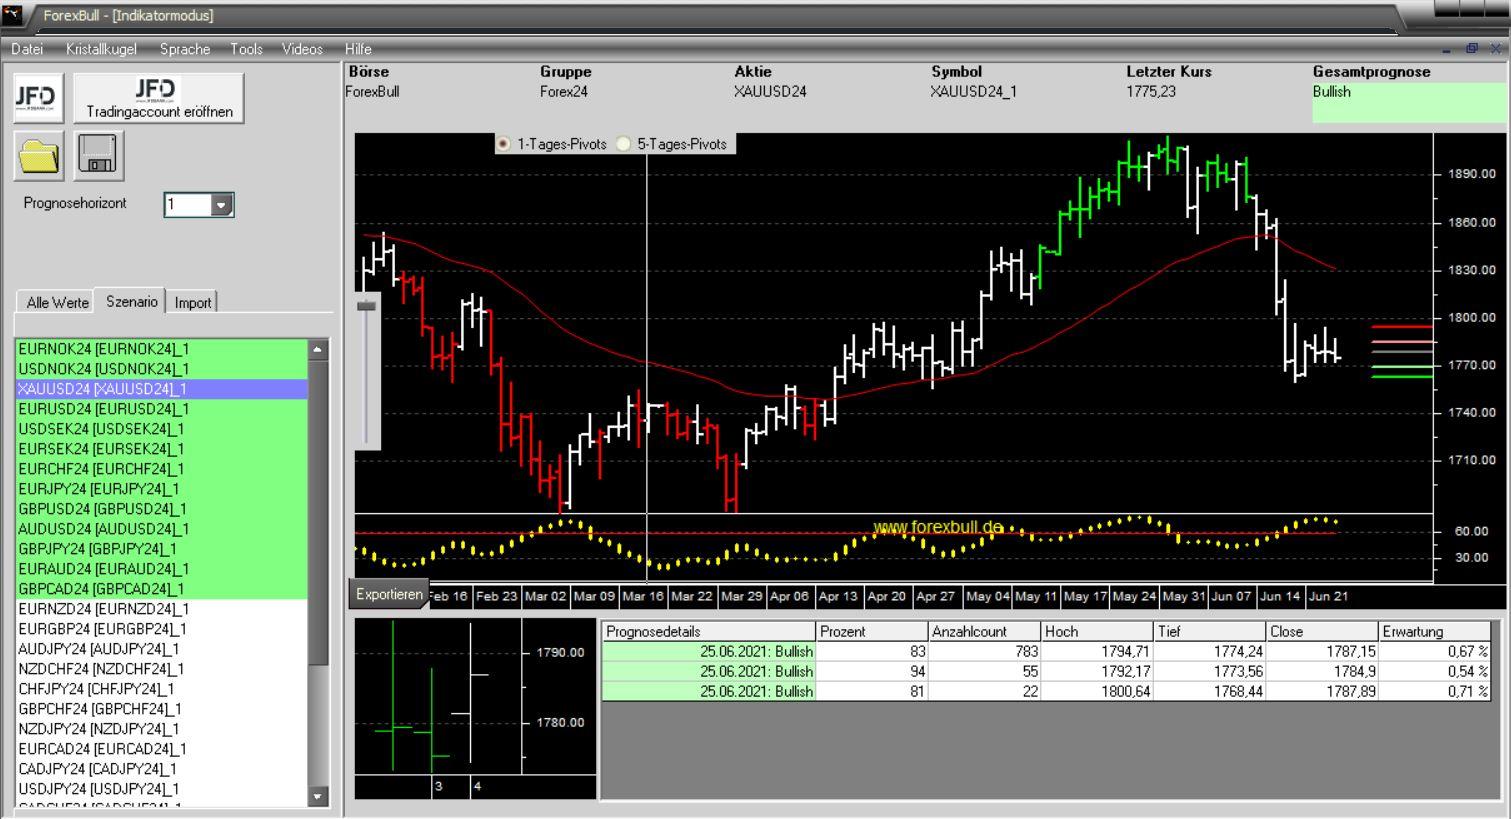 Morning-Briefing-ForexBull-GOLD-wiederholt-mit-einem-Long-Setup-Chartanalyse-JFD-Bank-GodmodeTrader.de-2